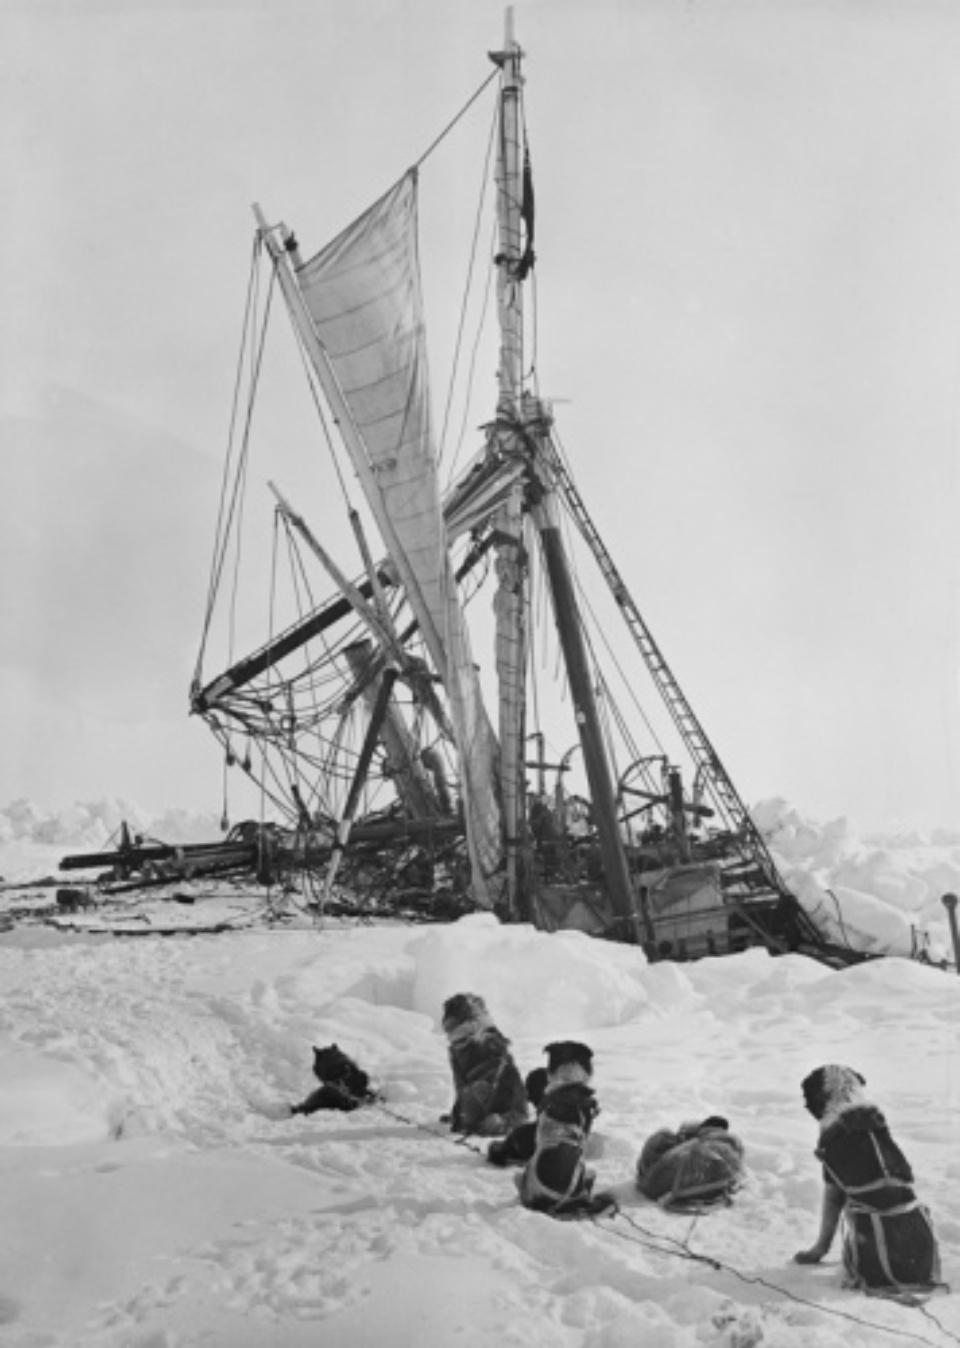 Frank Hurley Endurance crushed 1915